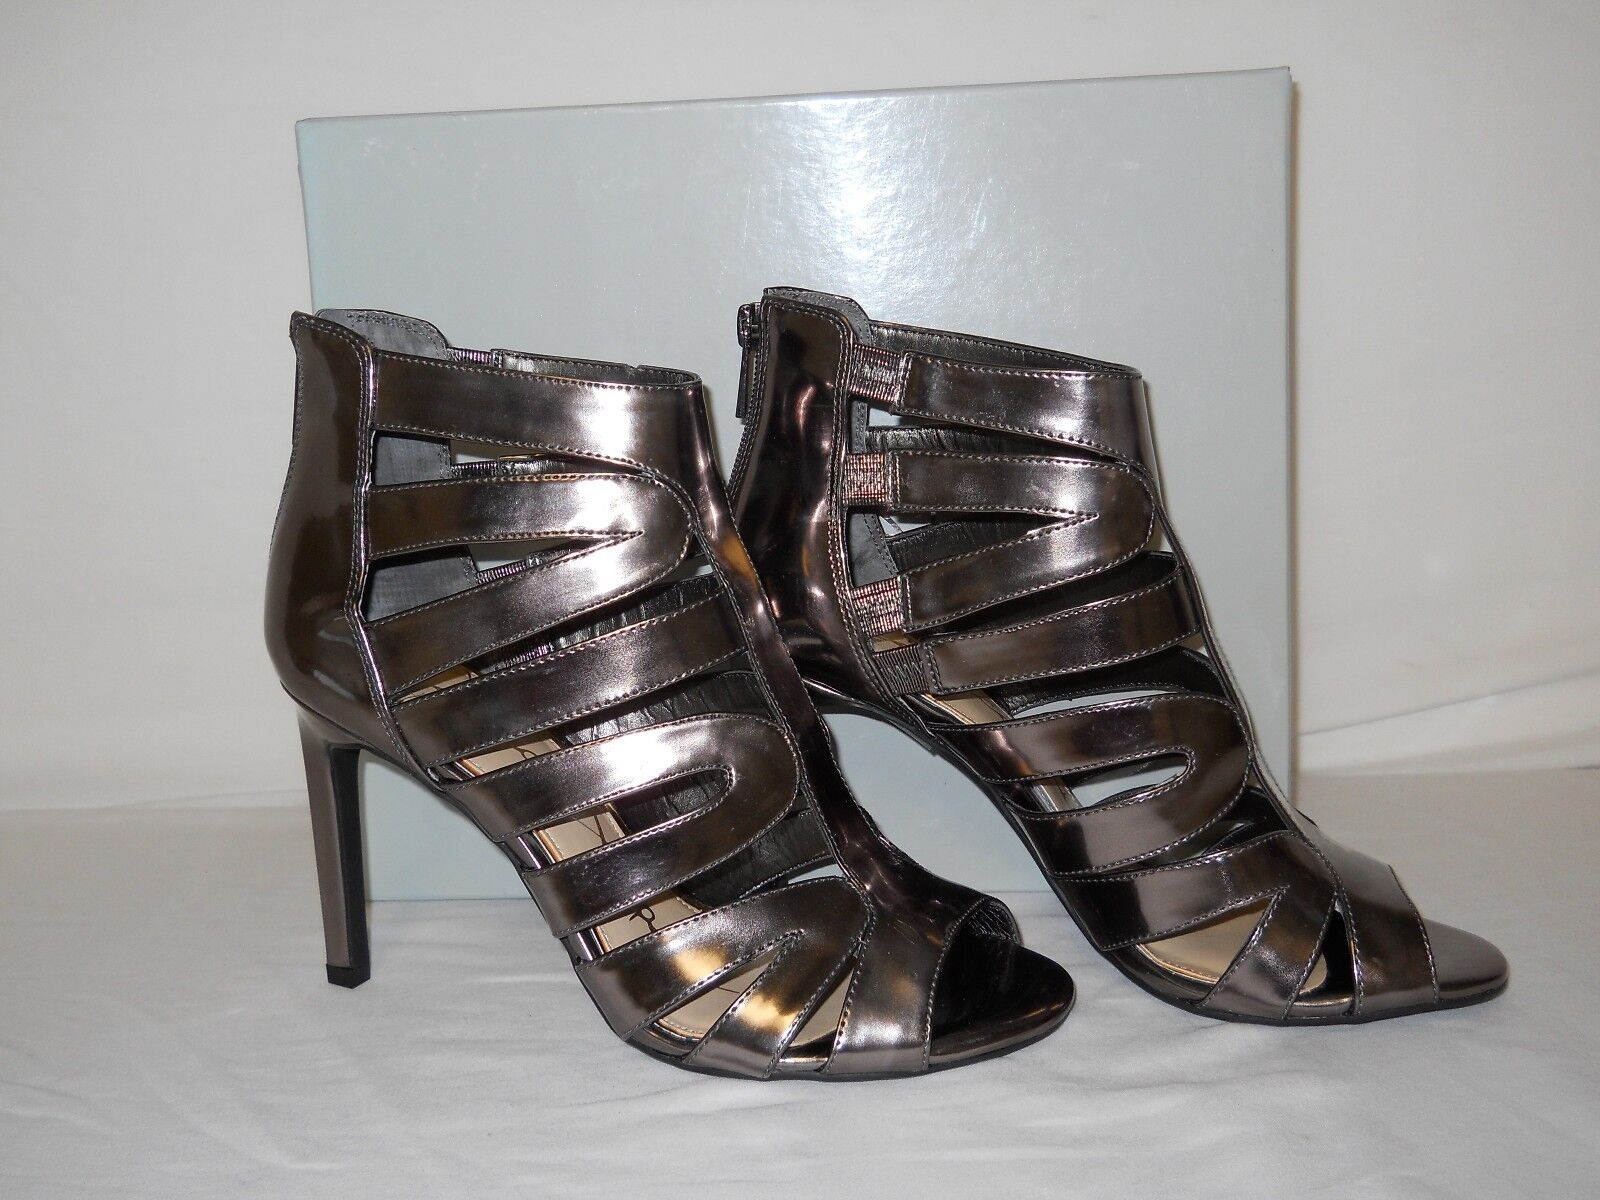 Jessica Simpson NEU Damenschuhe Careyy Gunmetal Caged Sandales 8 M Schuhes NWOB